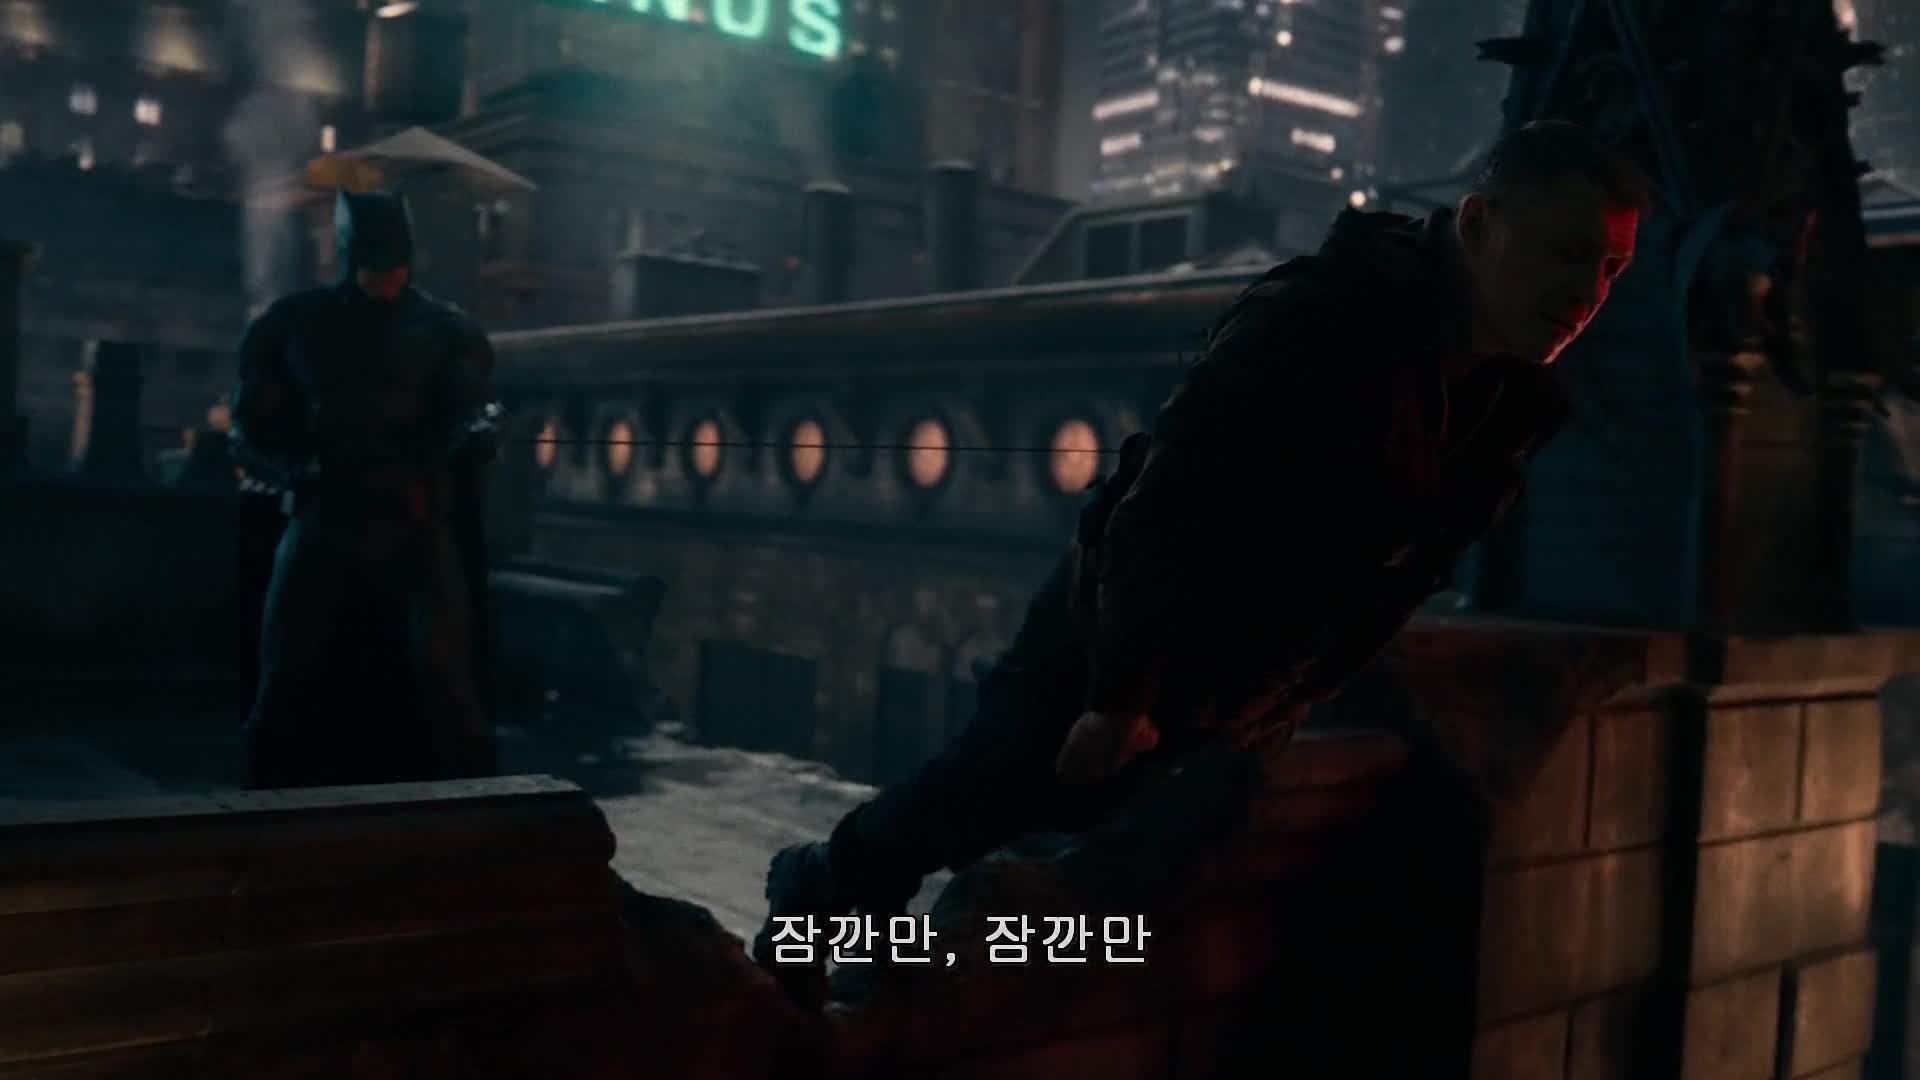 Justice League (2017) KORSUB - 1080p - HDRip - x264 - AAC-JesusLovesYew